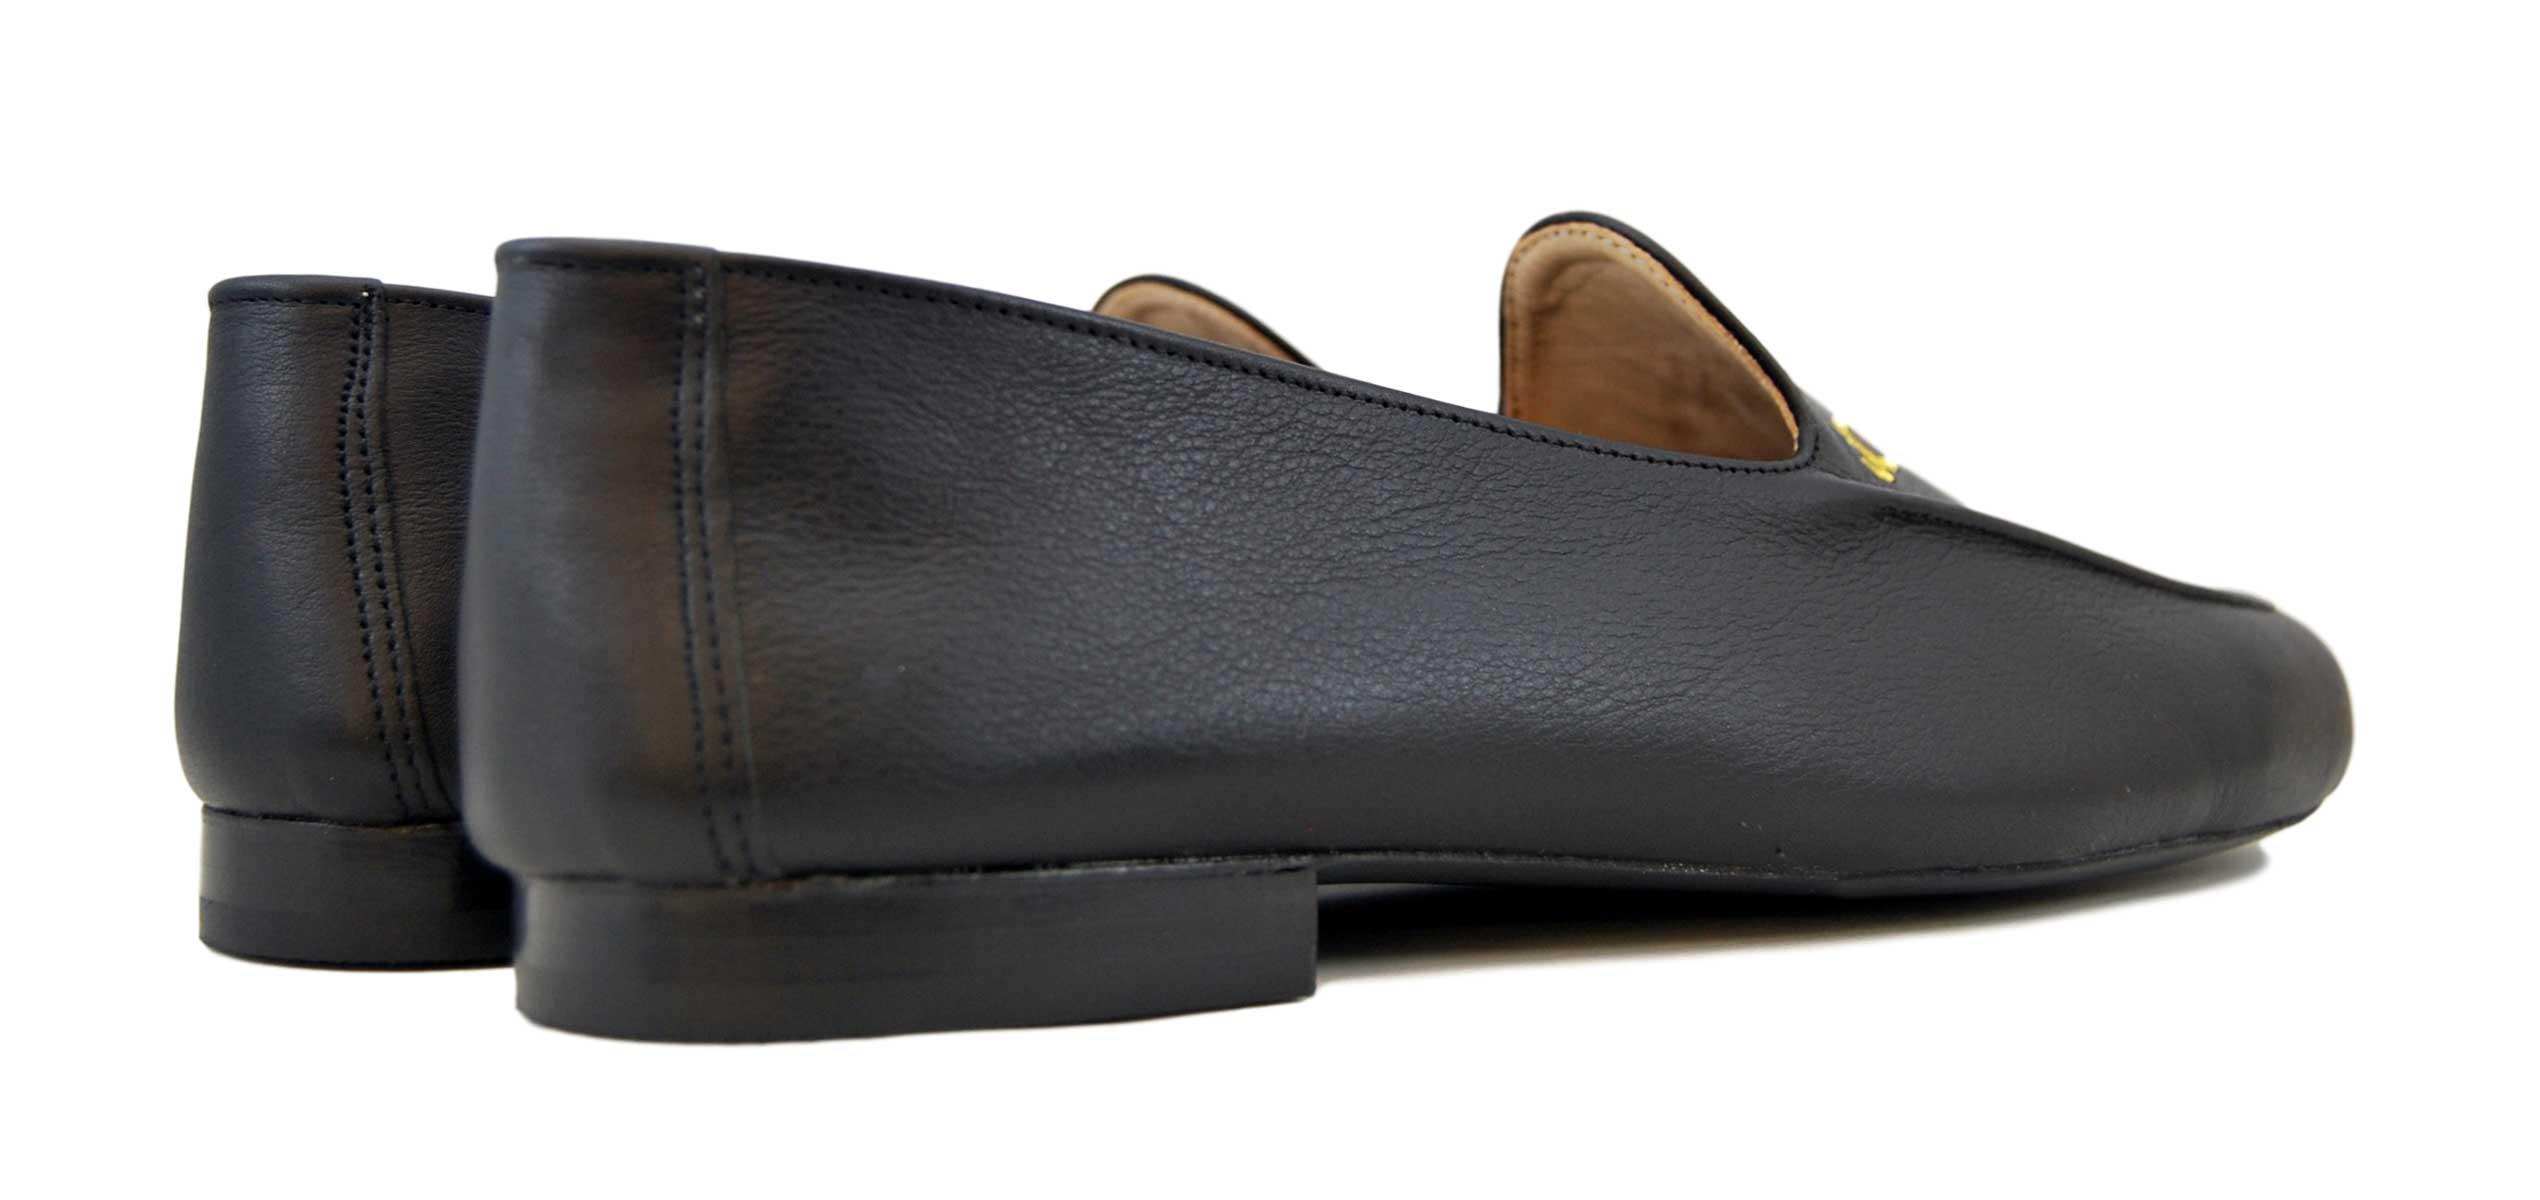 Foto 4 de Zapatos Julio Iglesias Mocasin 528 JC Negro Napa